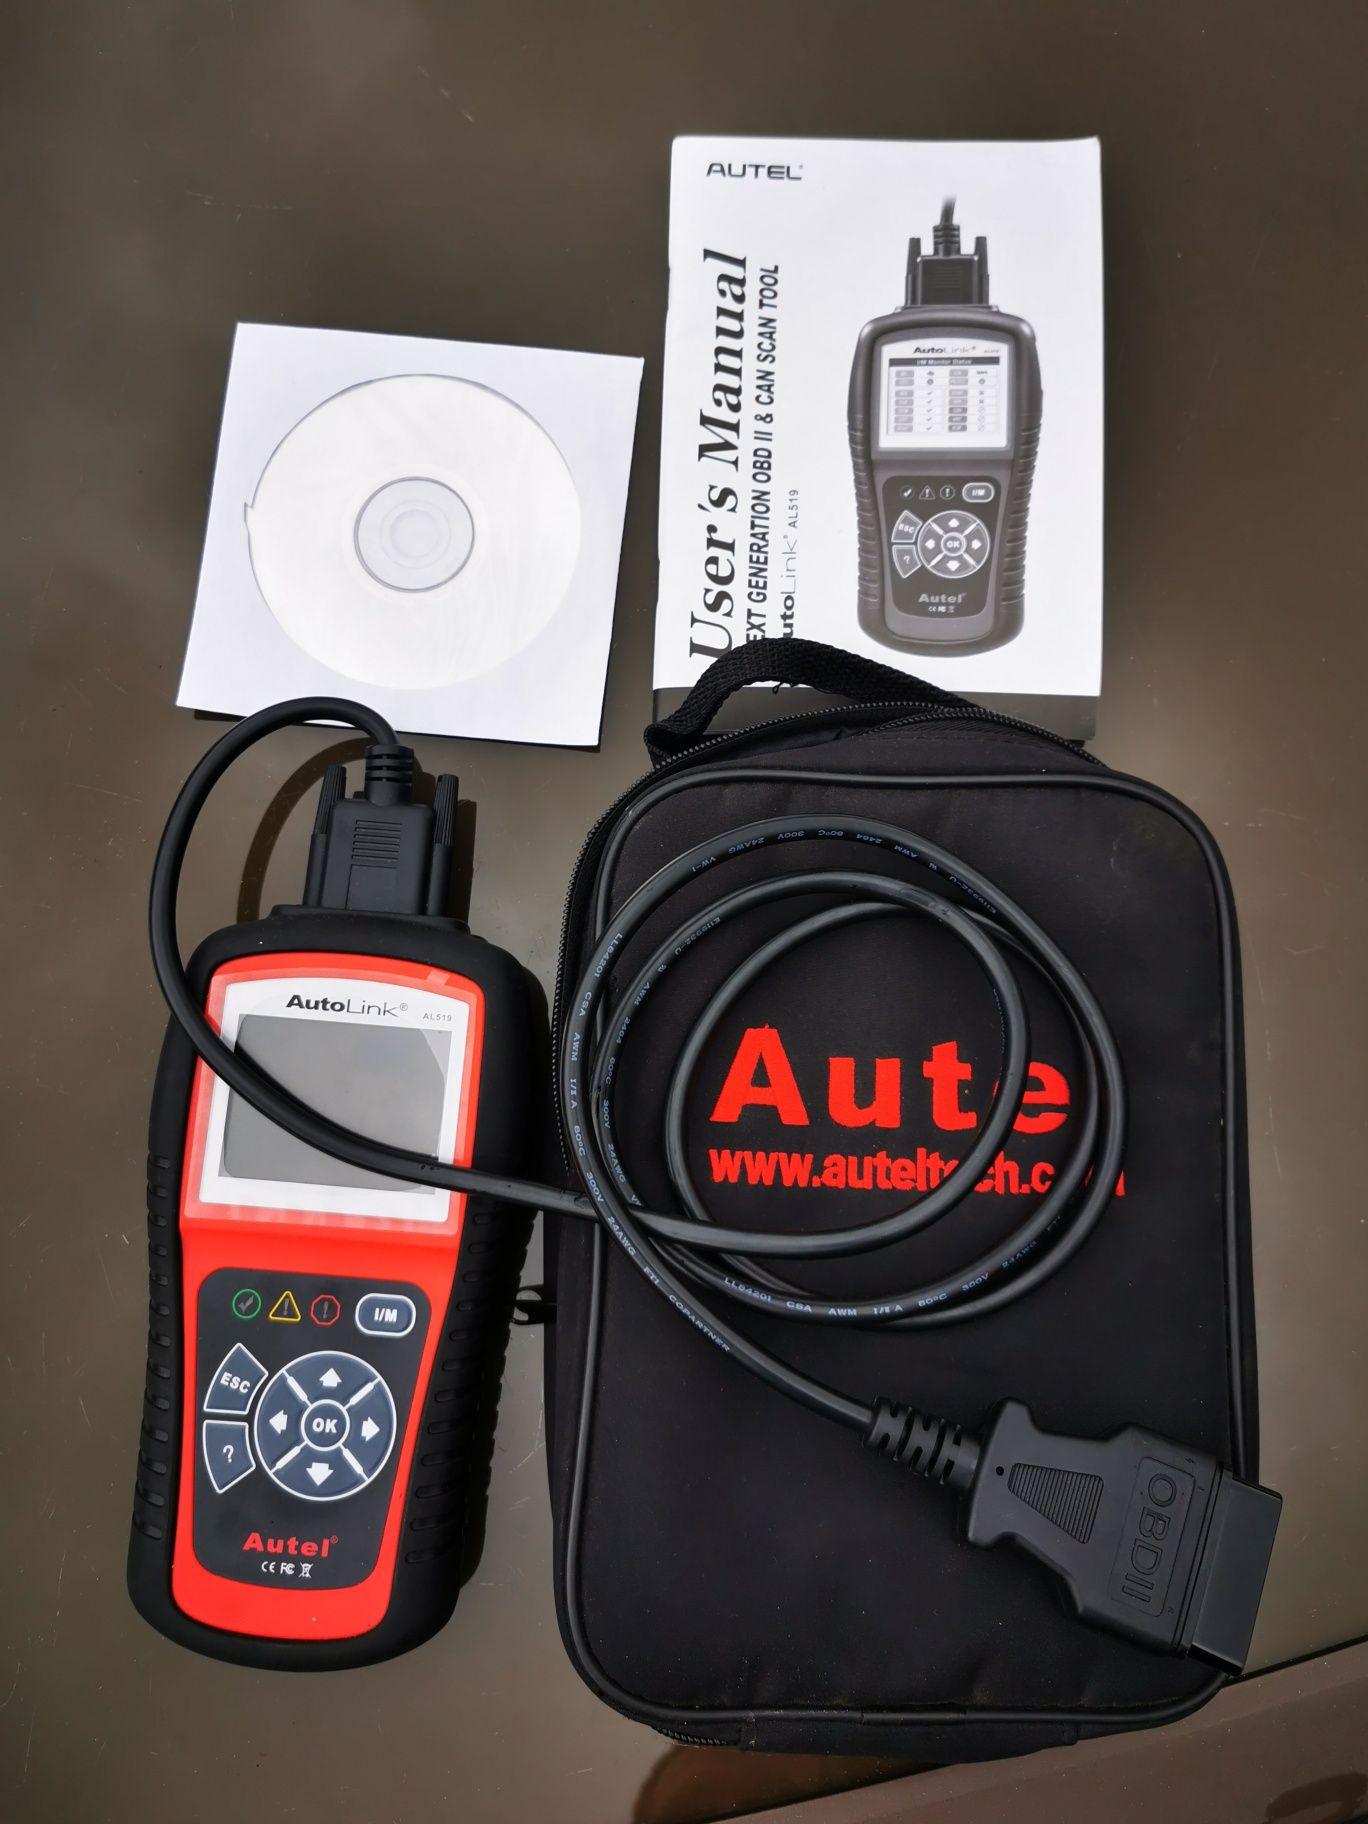 Autel Autolink AL519 komputer diagnostyczny.